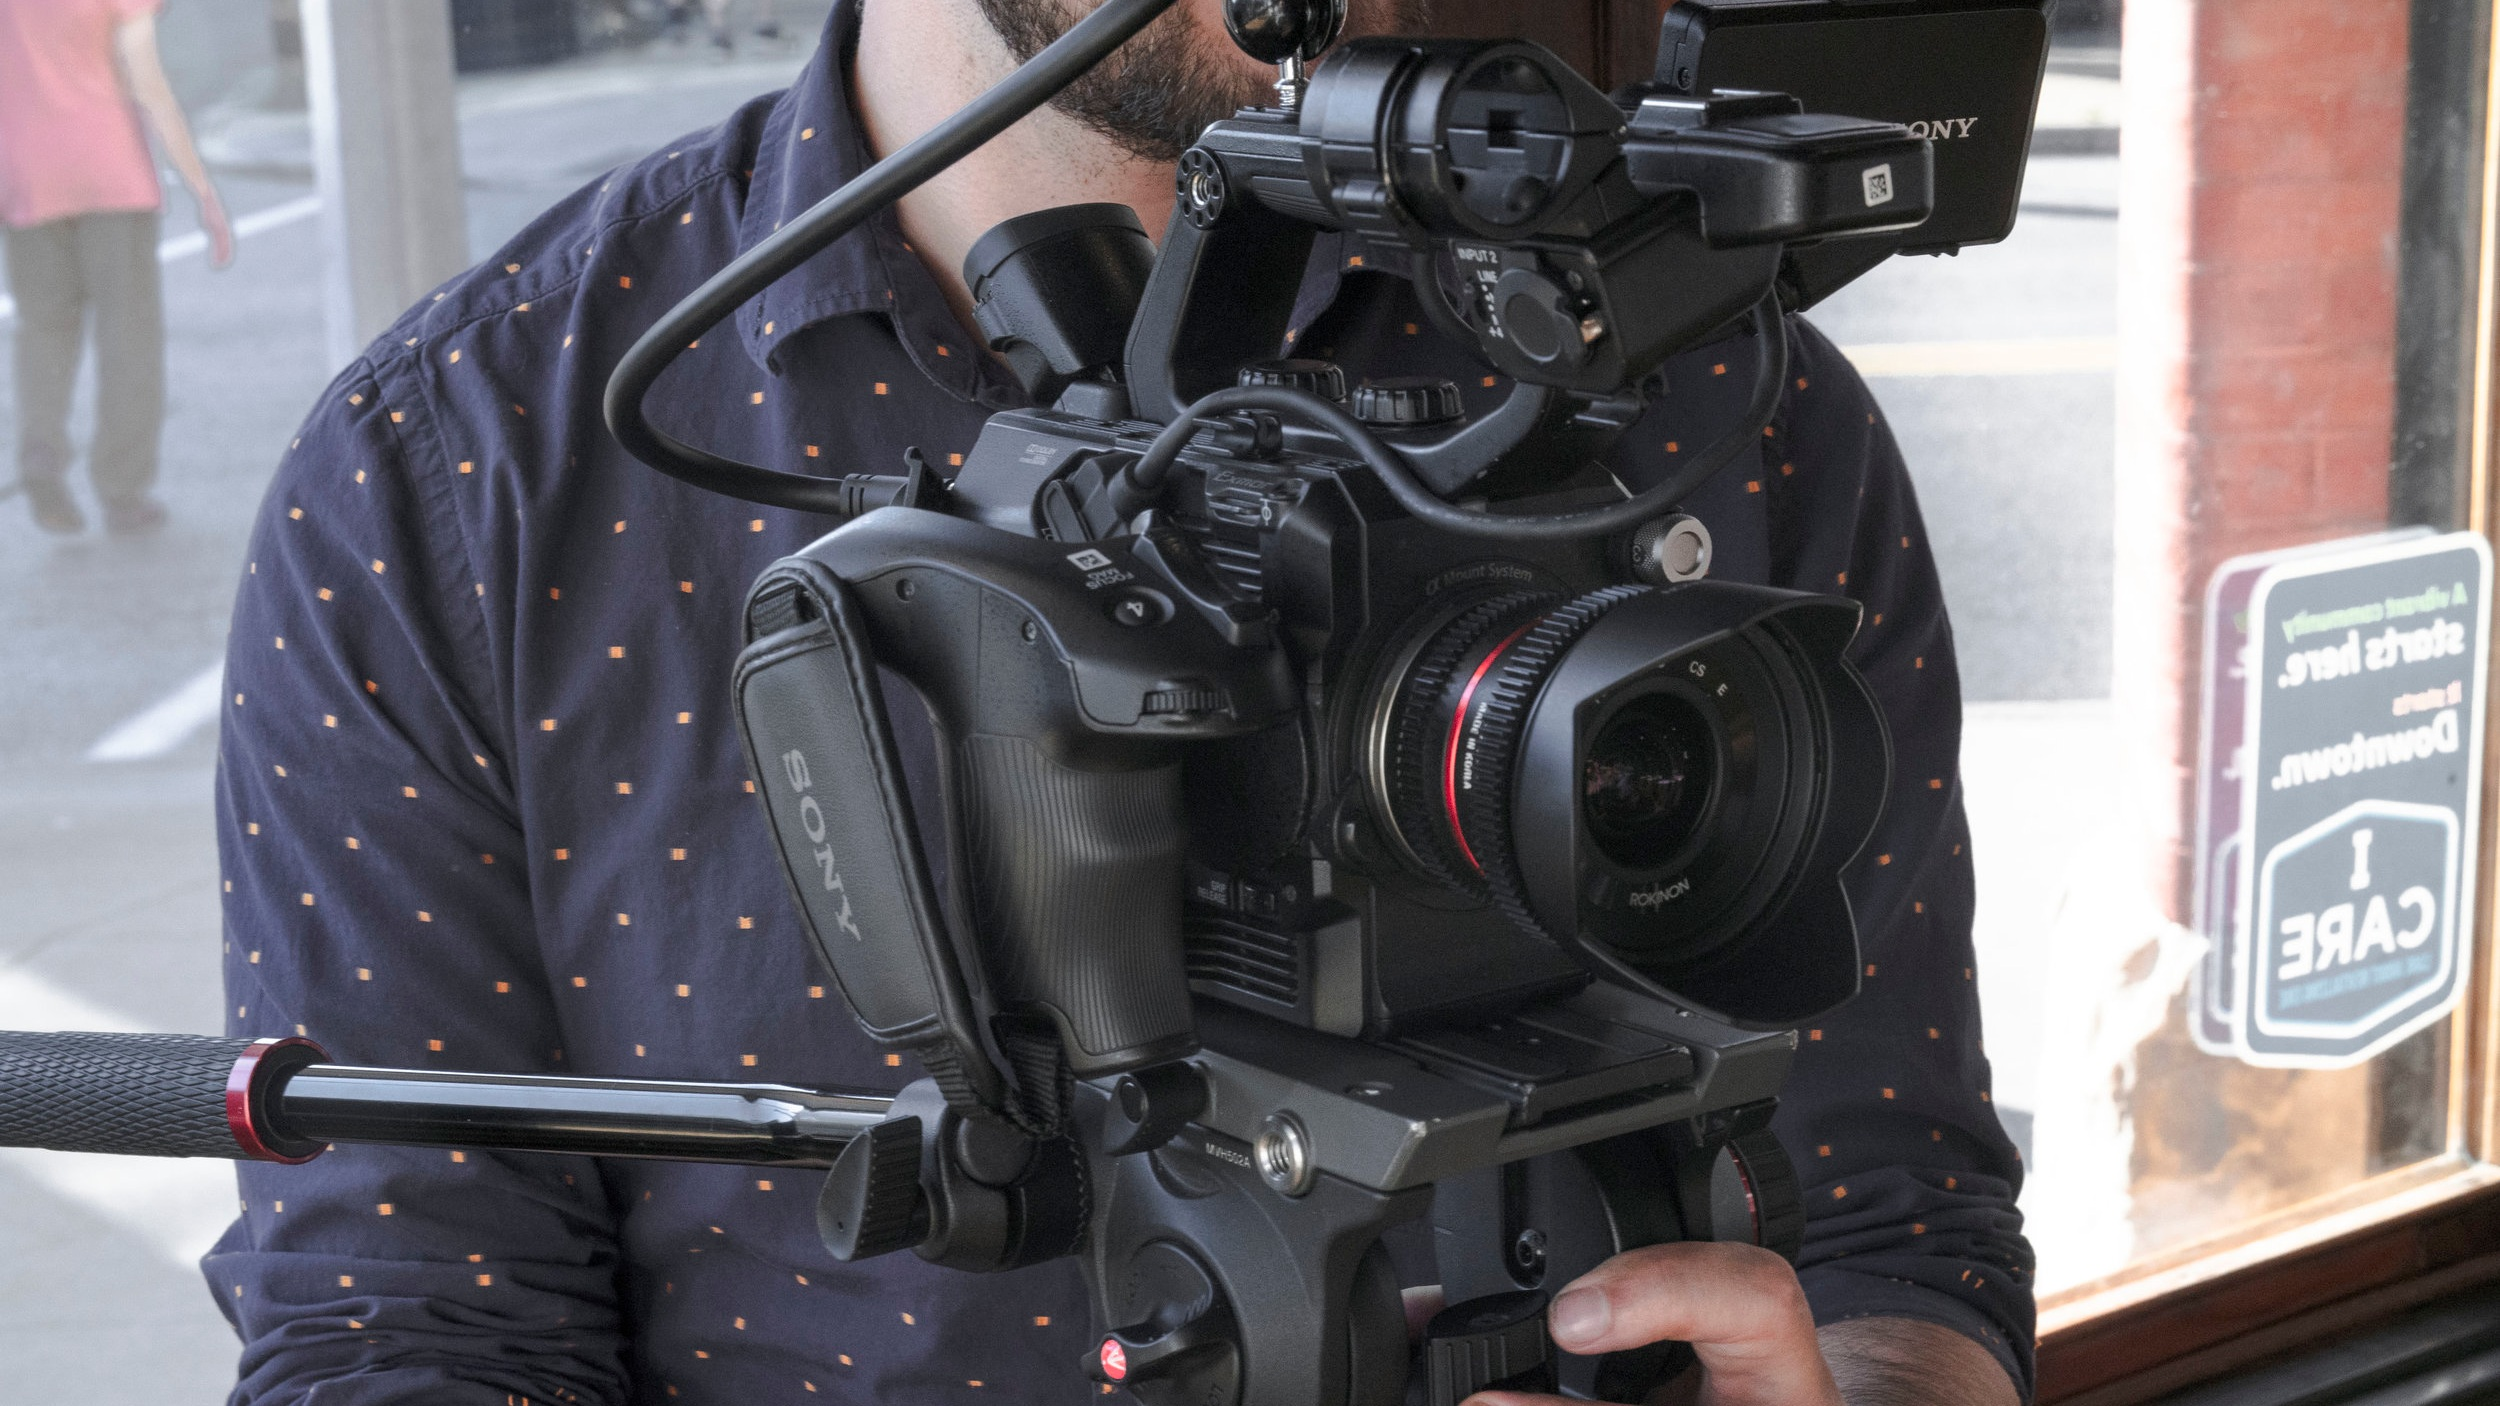 video production - ****BLURB******